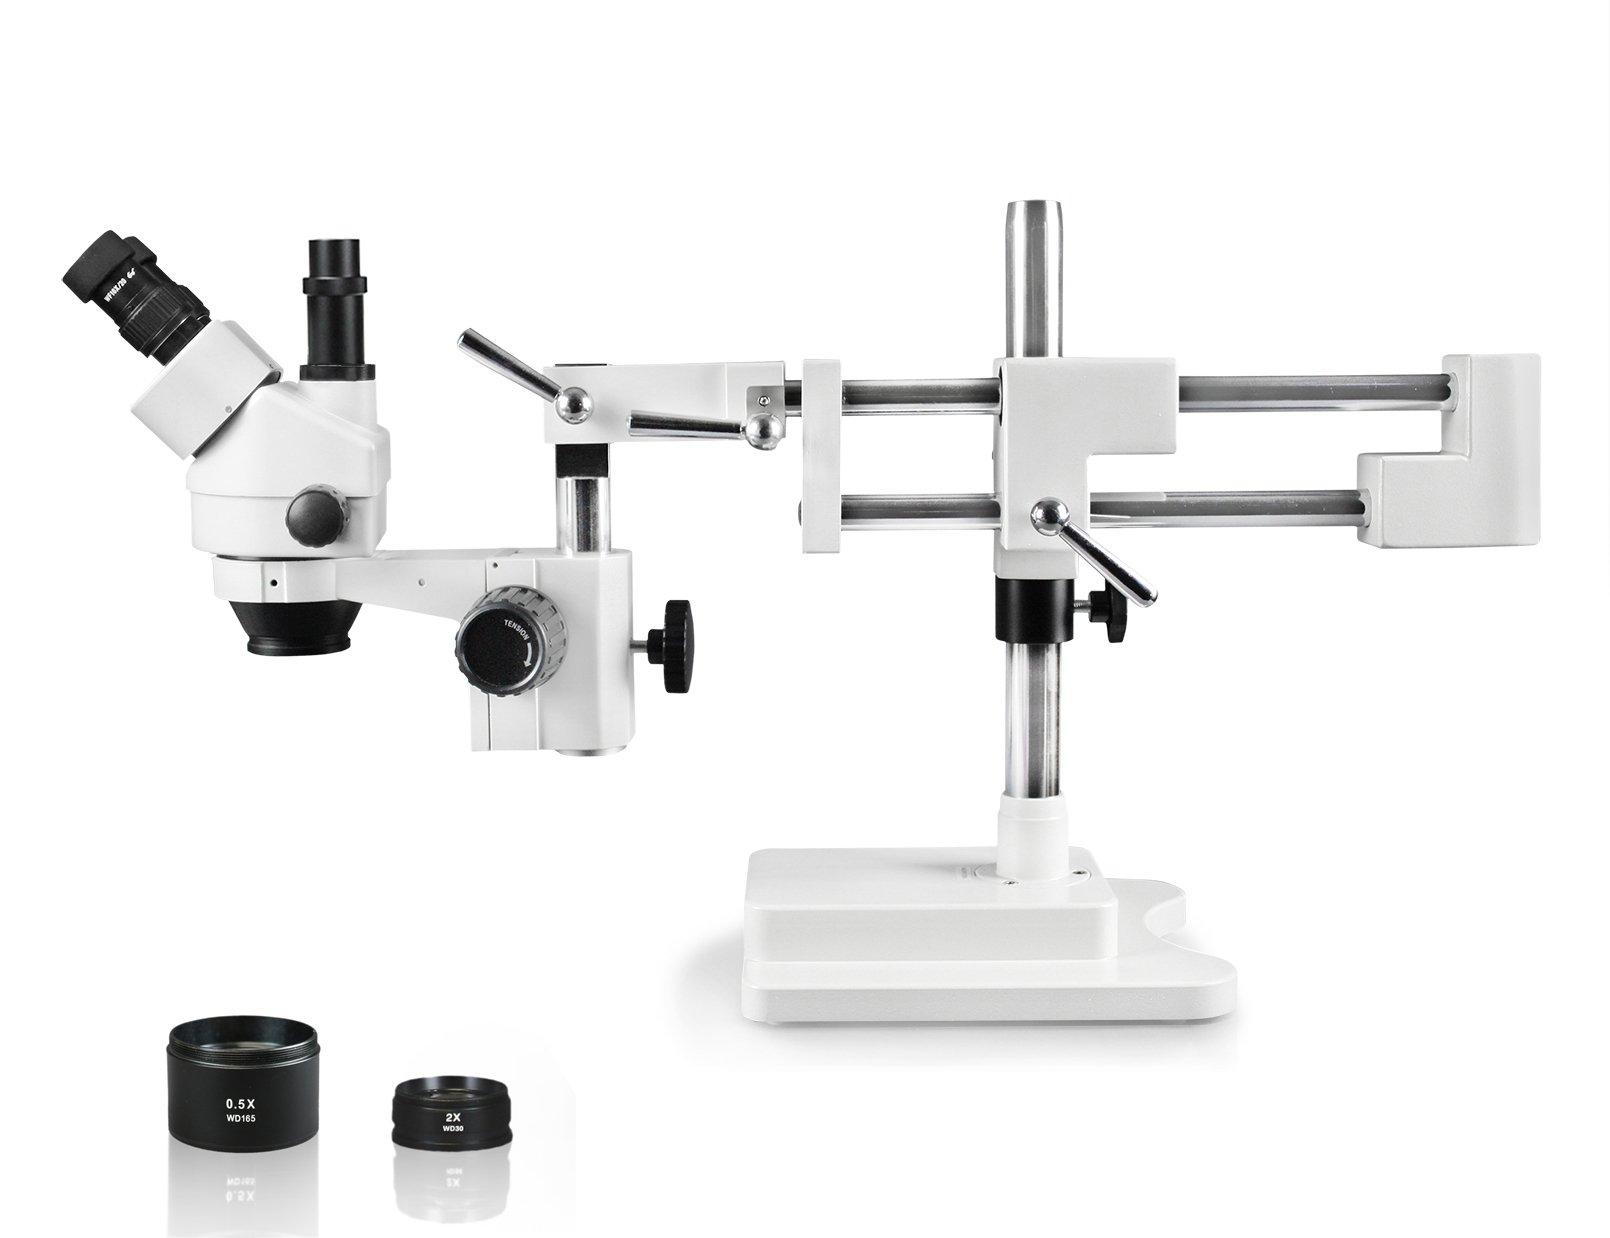 Vision Scientific VS-5FZ Trinocular Zoom Stereo Microscope, 10x WF Eyepiece, 0.7x—4.5x Zoom, 3.5x—90x Magnification, 0.5x & 2x Auxiliary Lens, Double Arm Boom Stand